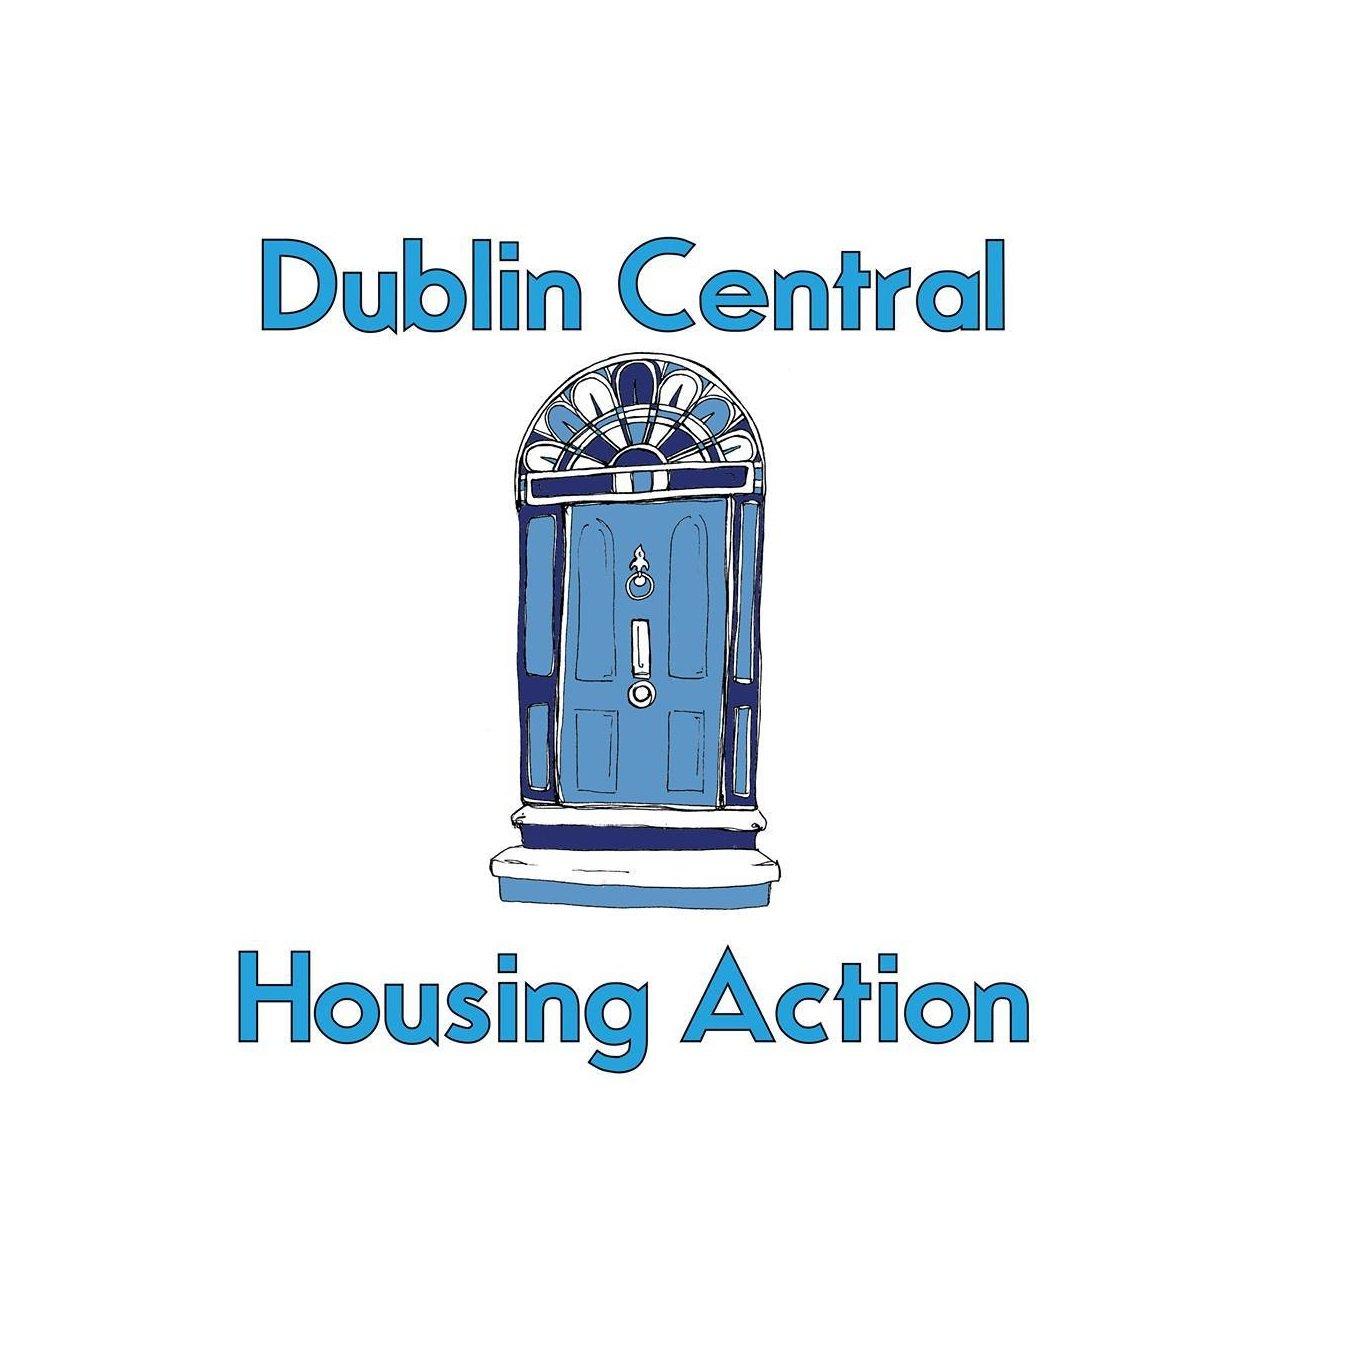 Dublin Central Housing Action